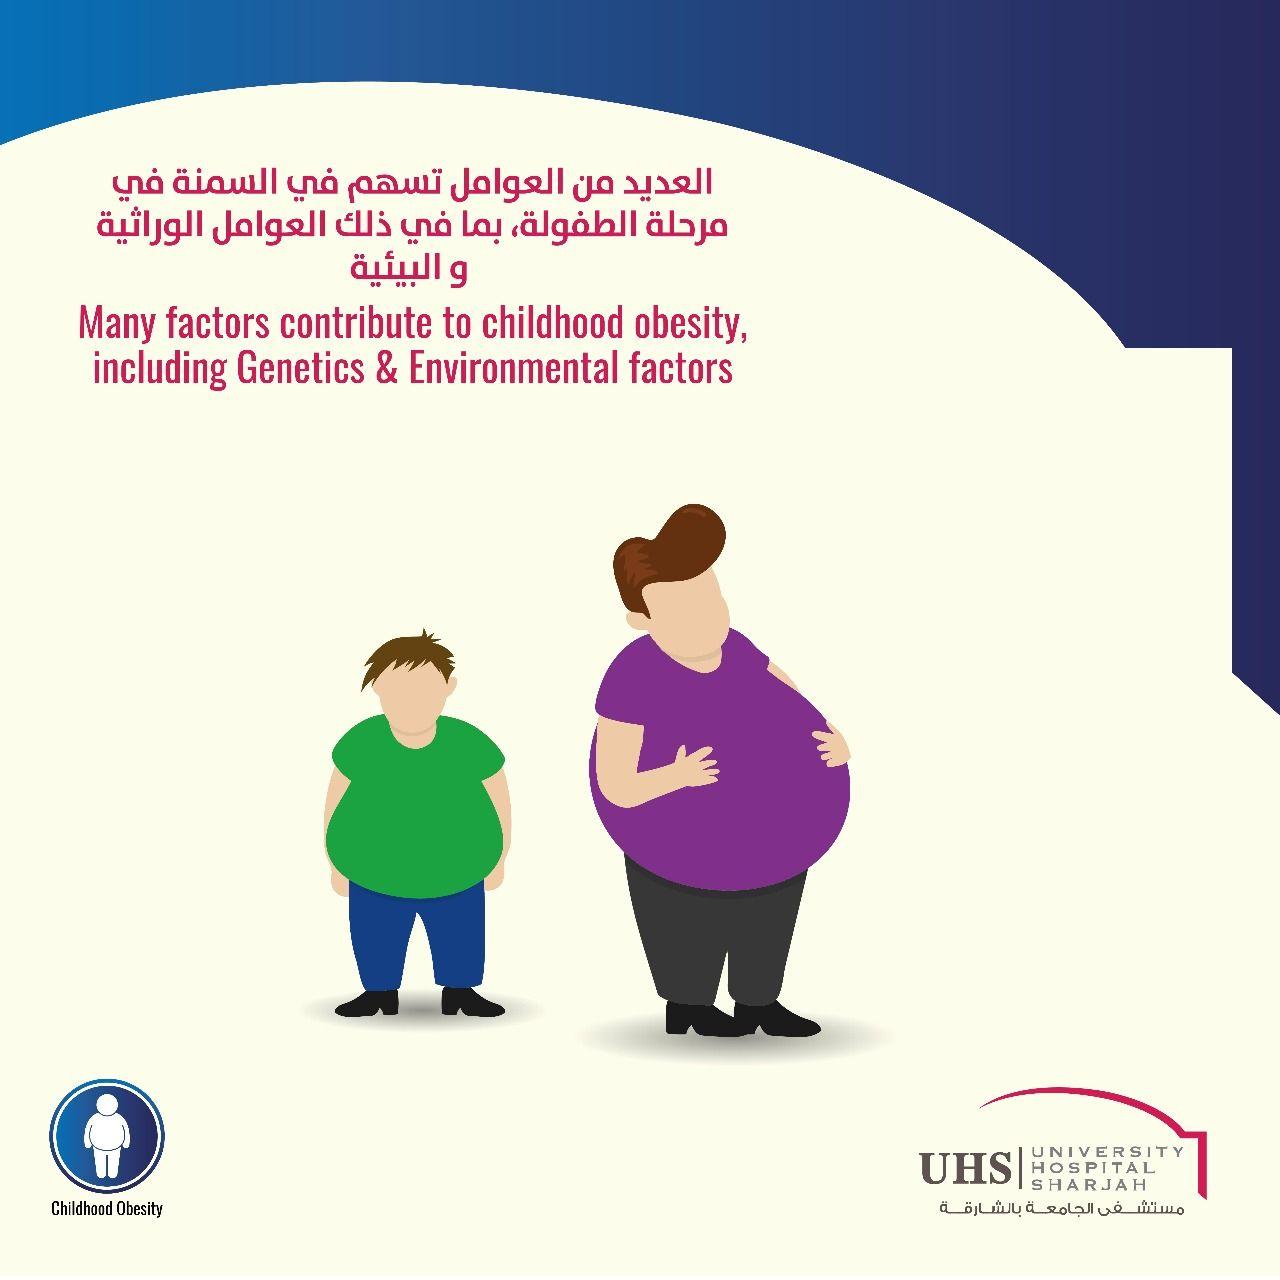 Pin By University Hospital Sharjah On Chidlhood Obesity Childhood Obesity Environmental Factors Obesity